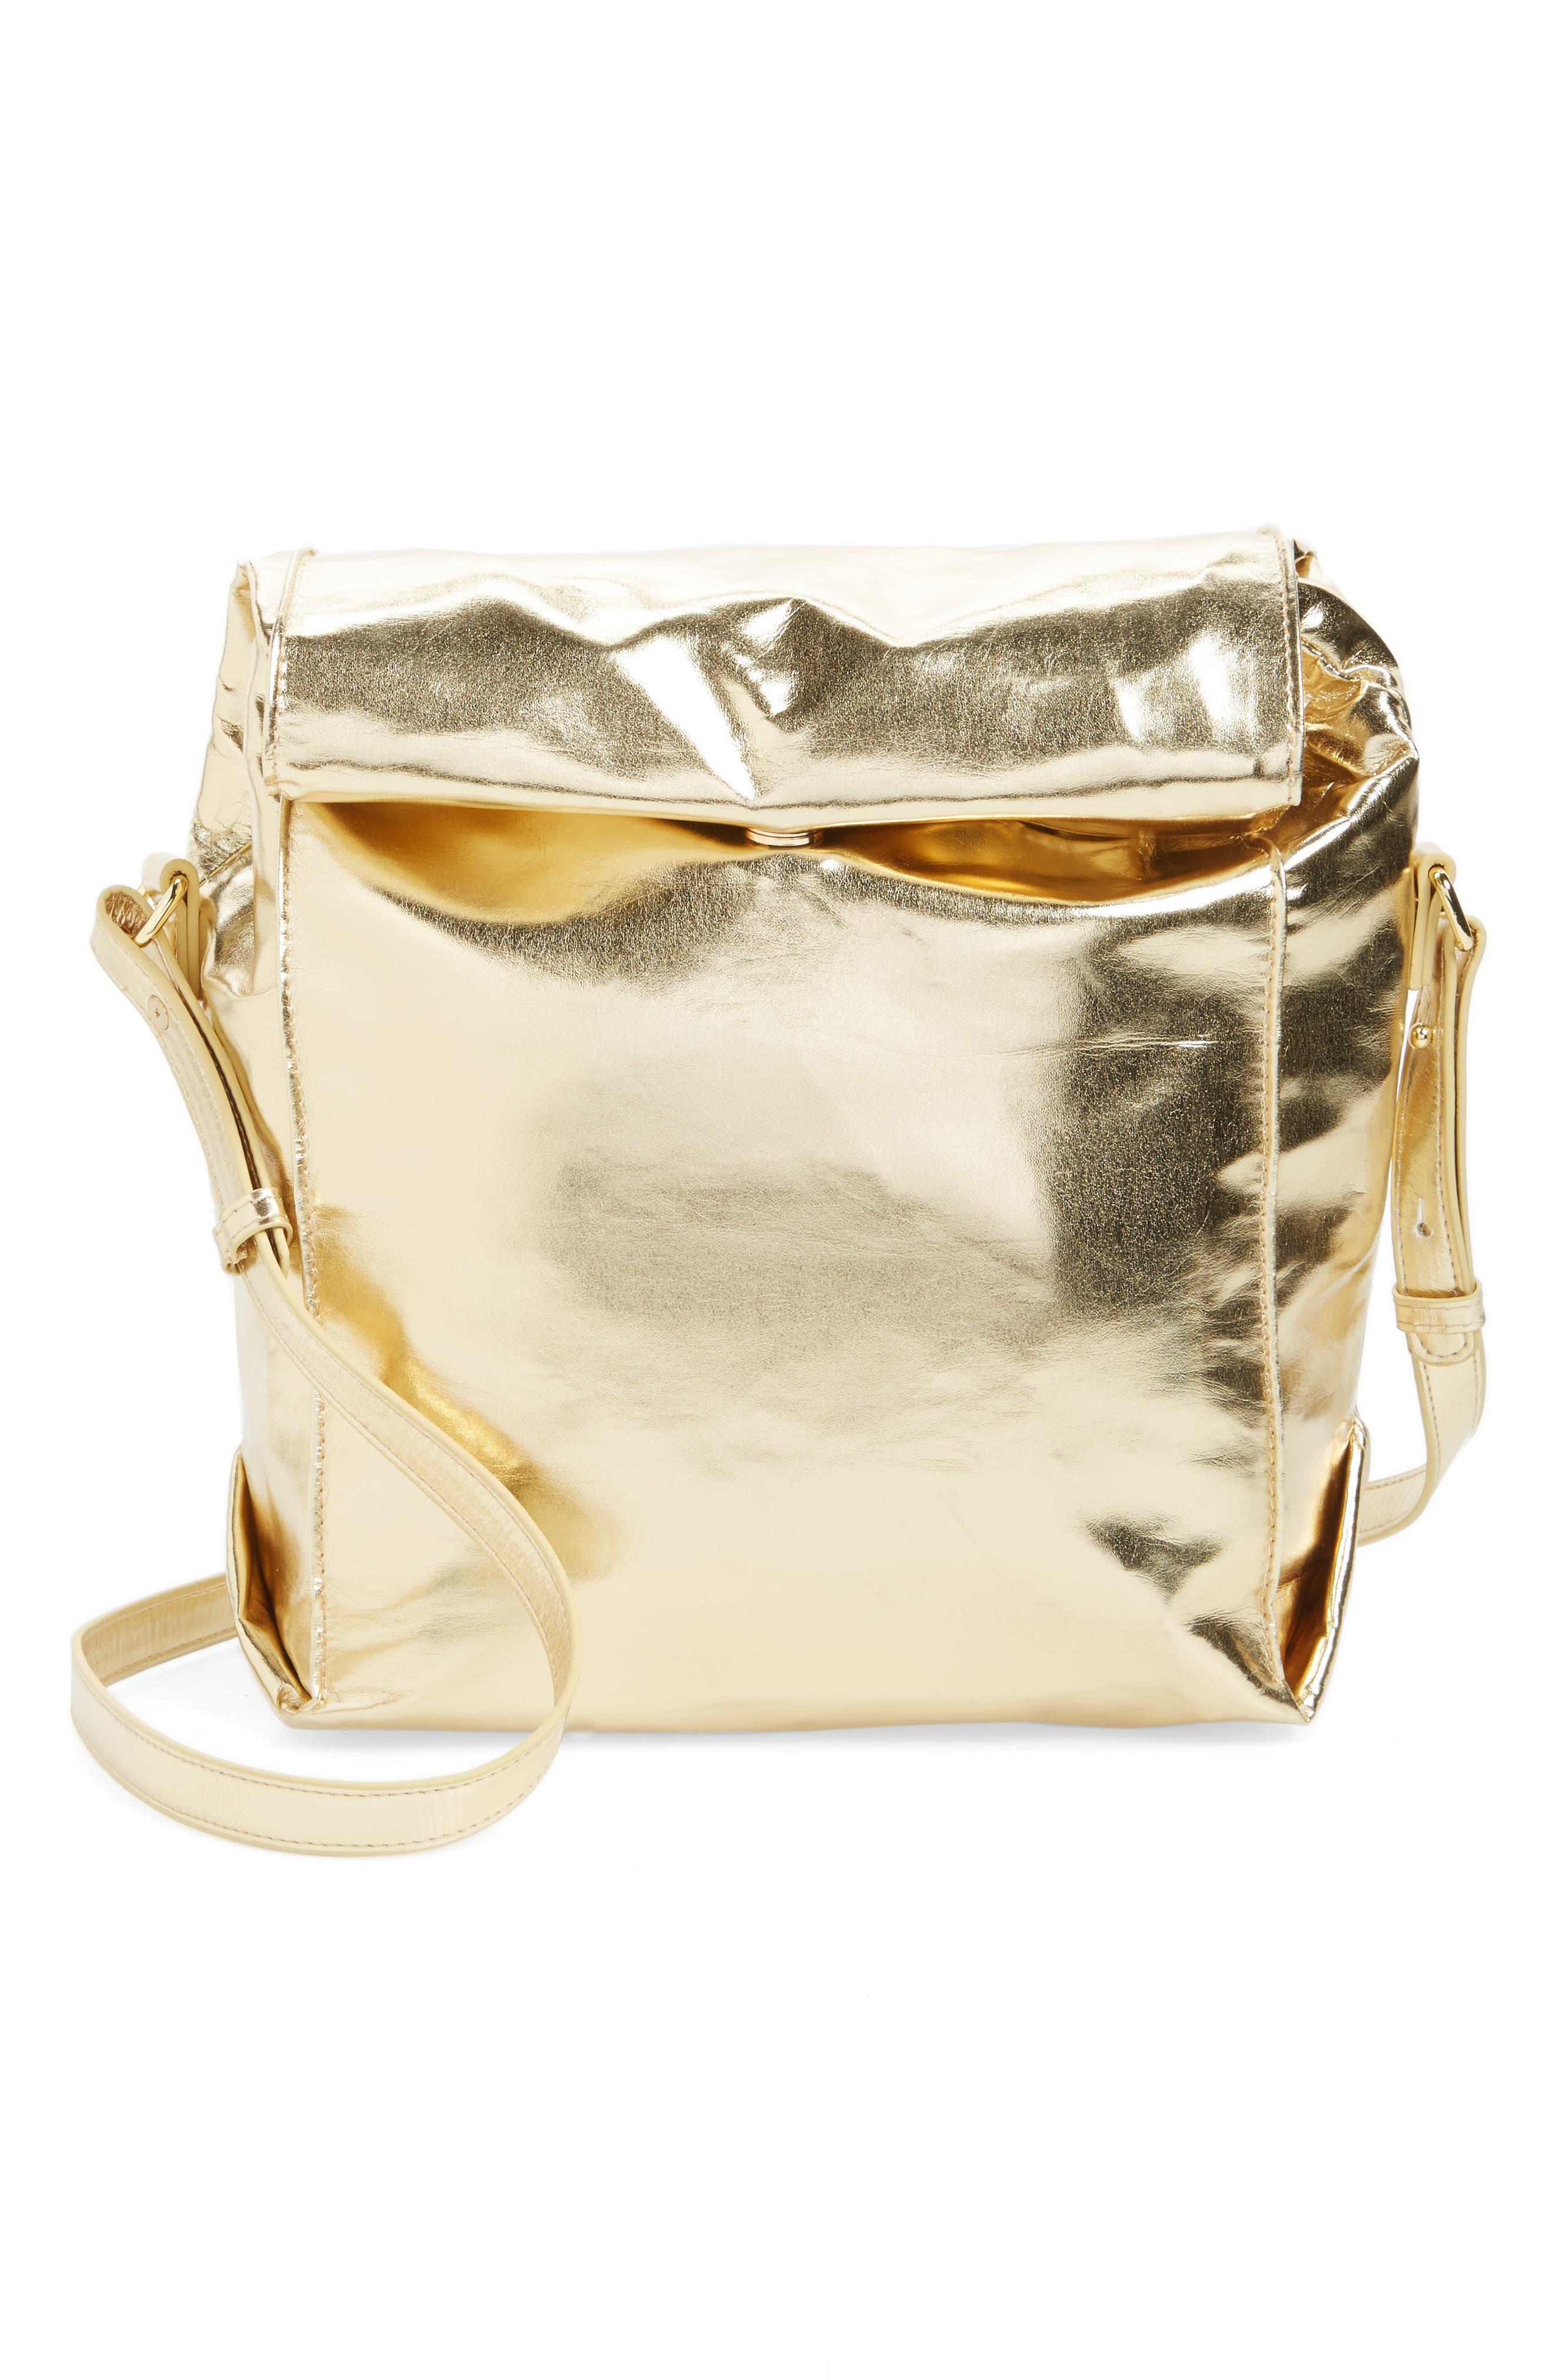 Crossbody Lunch Bag,                             Main thumbnail 1, color,                             Metallic Gold